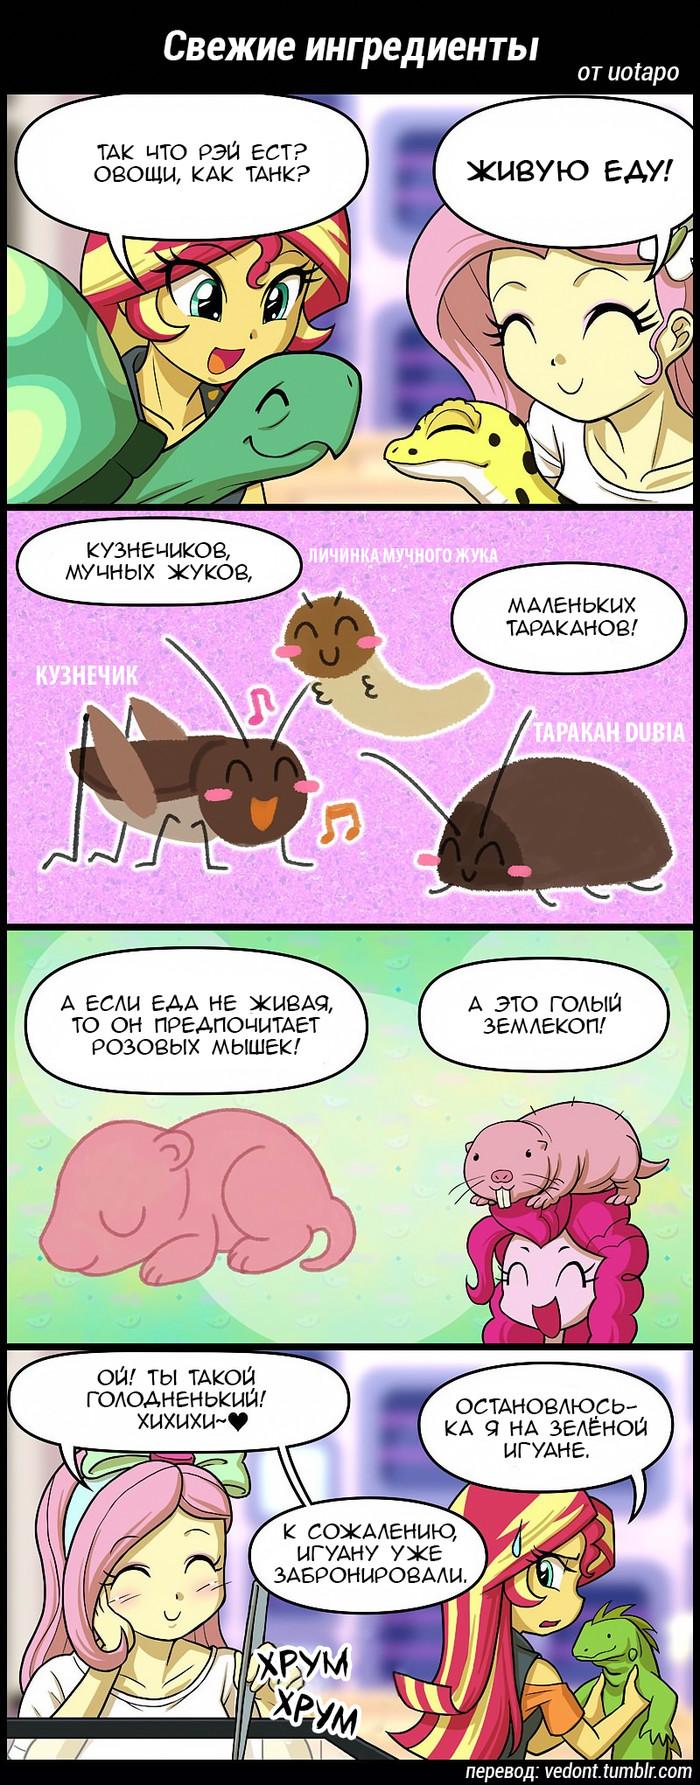 [Перевод] Свежие ингредиенты Перевод, Комиксы, My little pony, Fluttershy, Sunset Shimmer, Ray, Танки, Pinkie Pie, Длиннопост